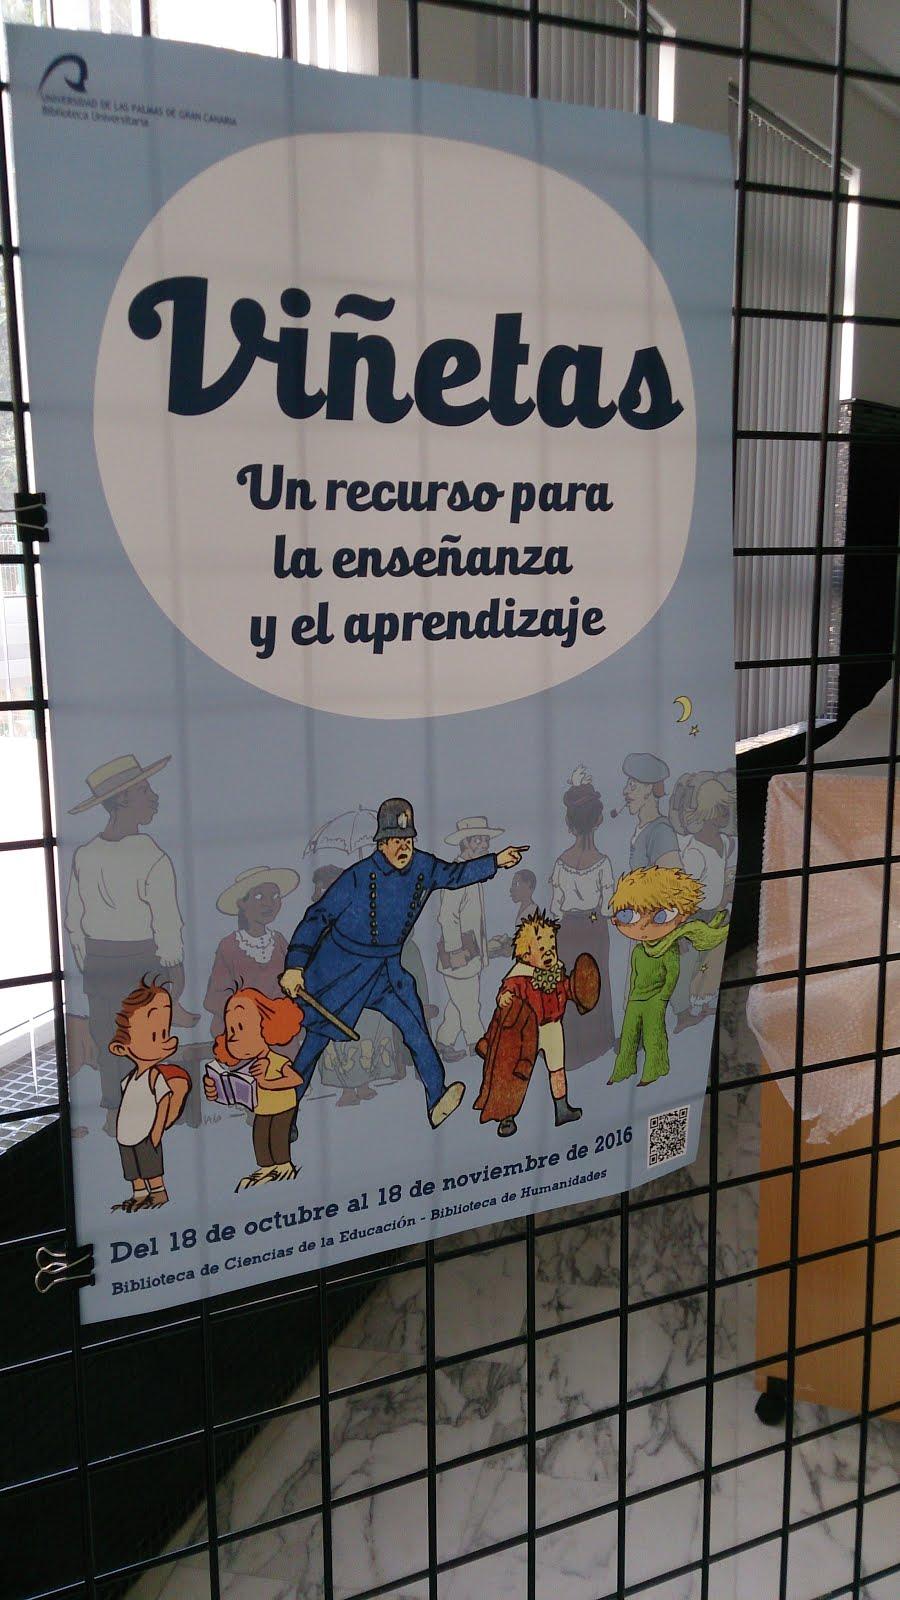 Del 18/10 al 18/11 Biblioteca Campus del Obelisco